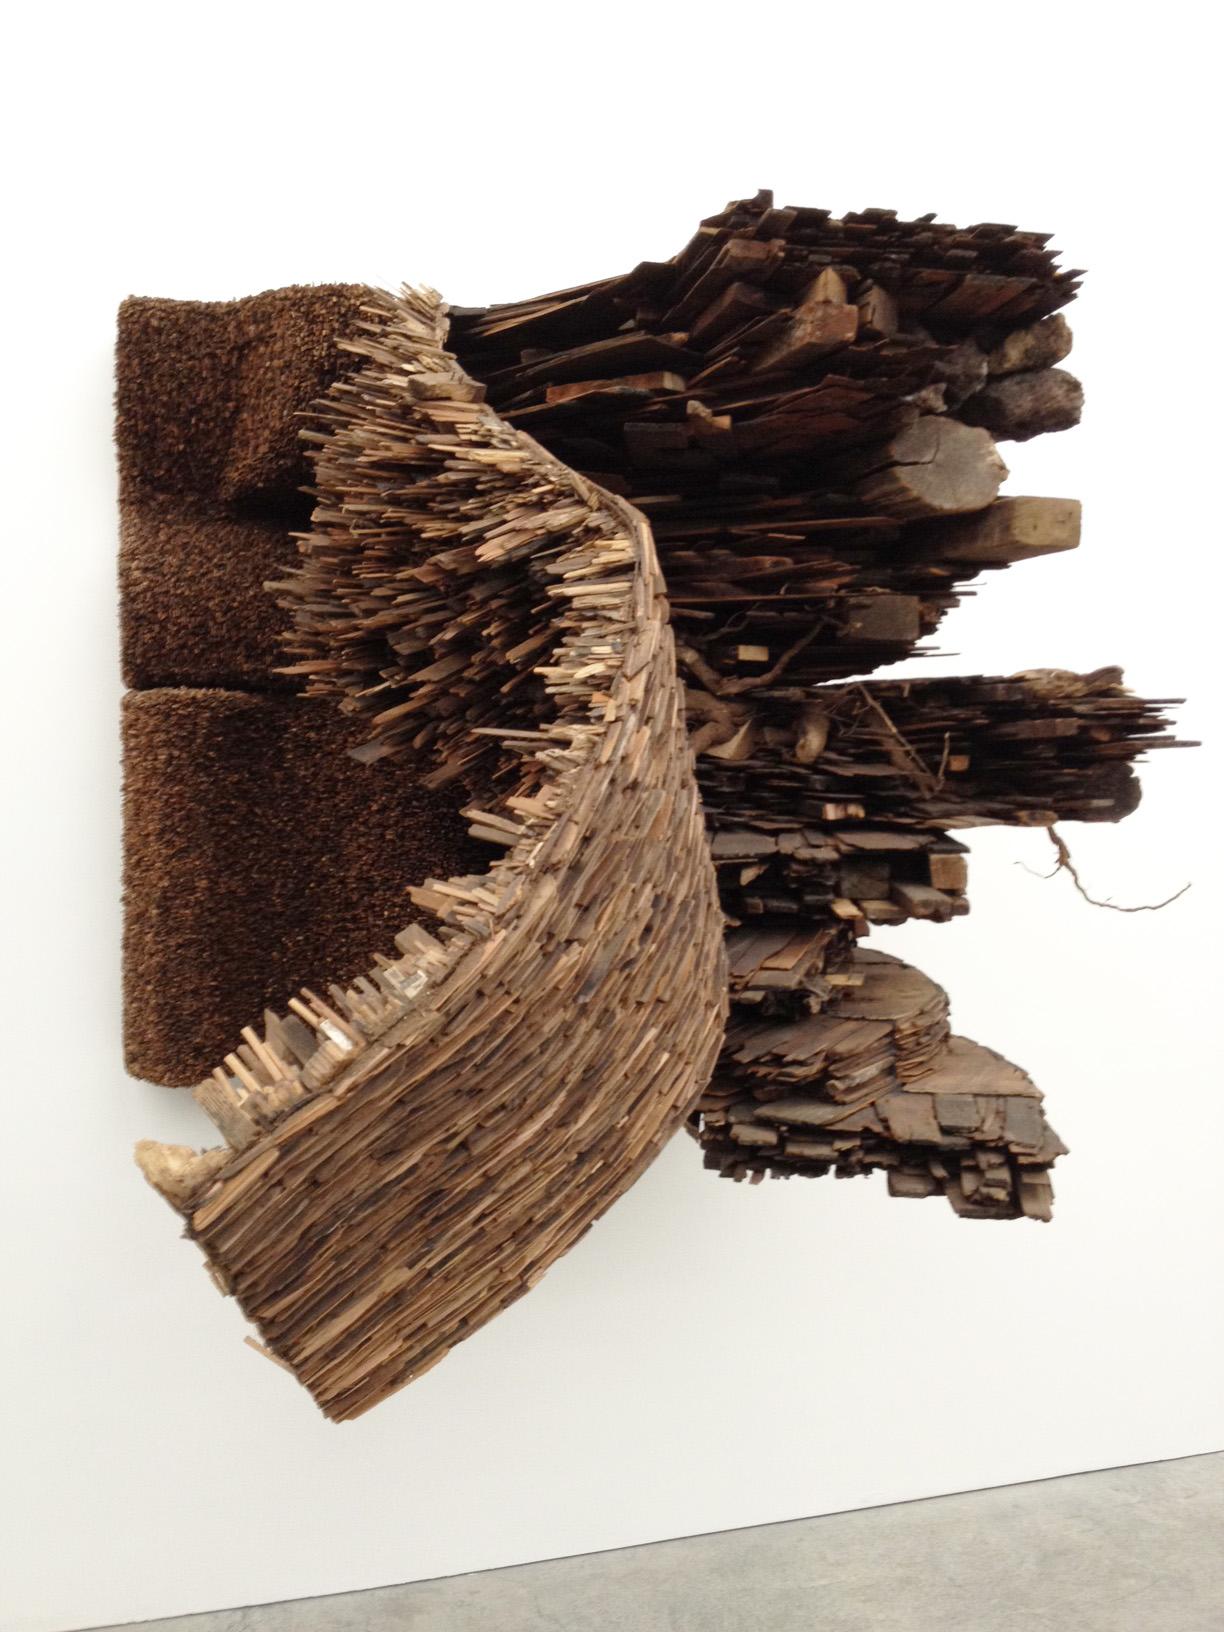 Monumental Aged Wood Constructions by Leonardo Drew